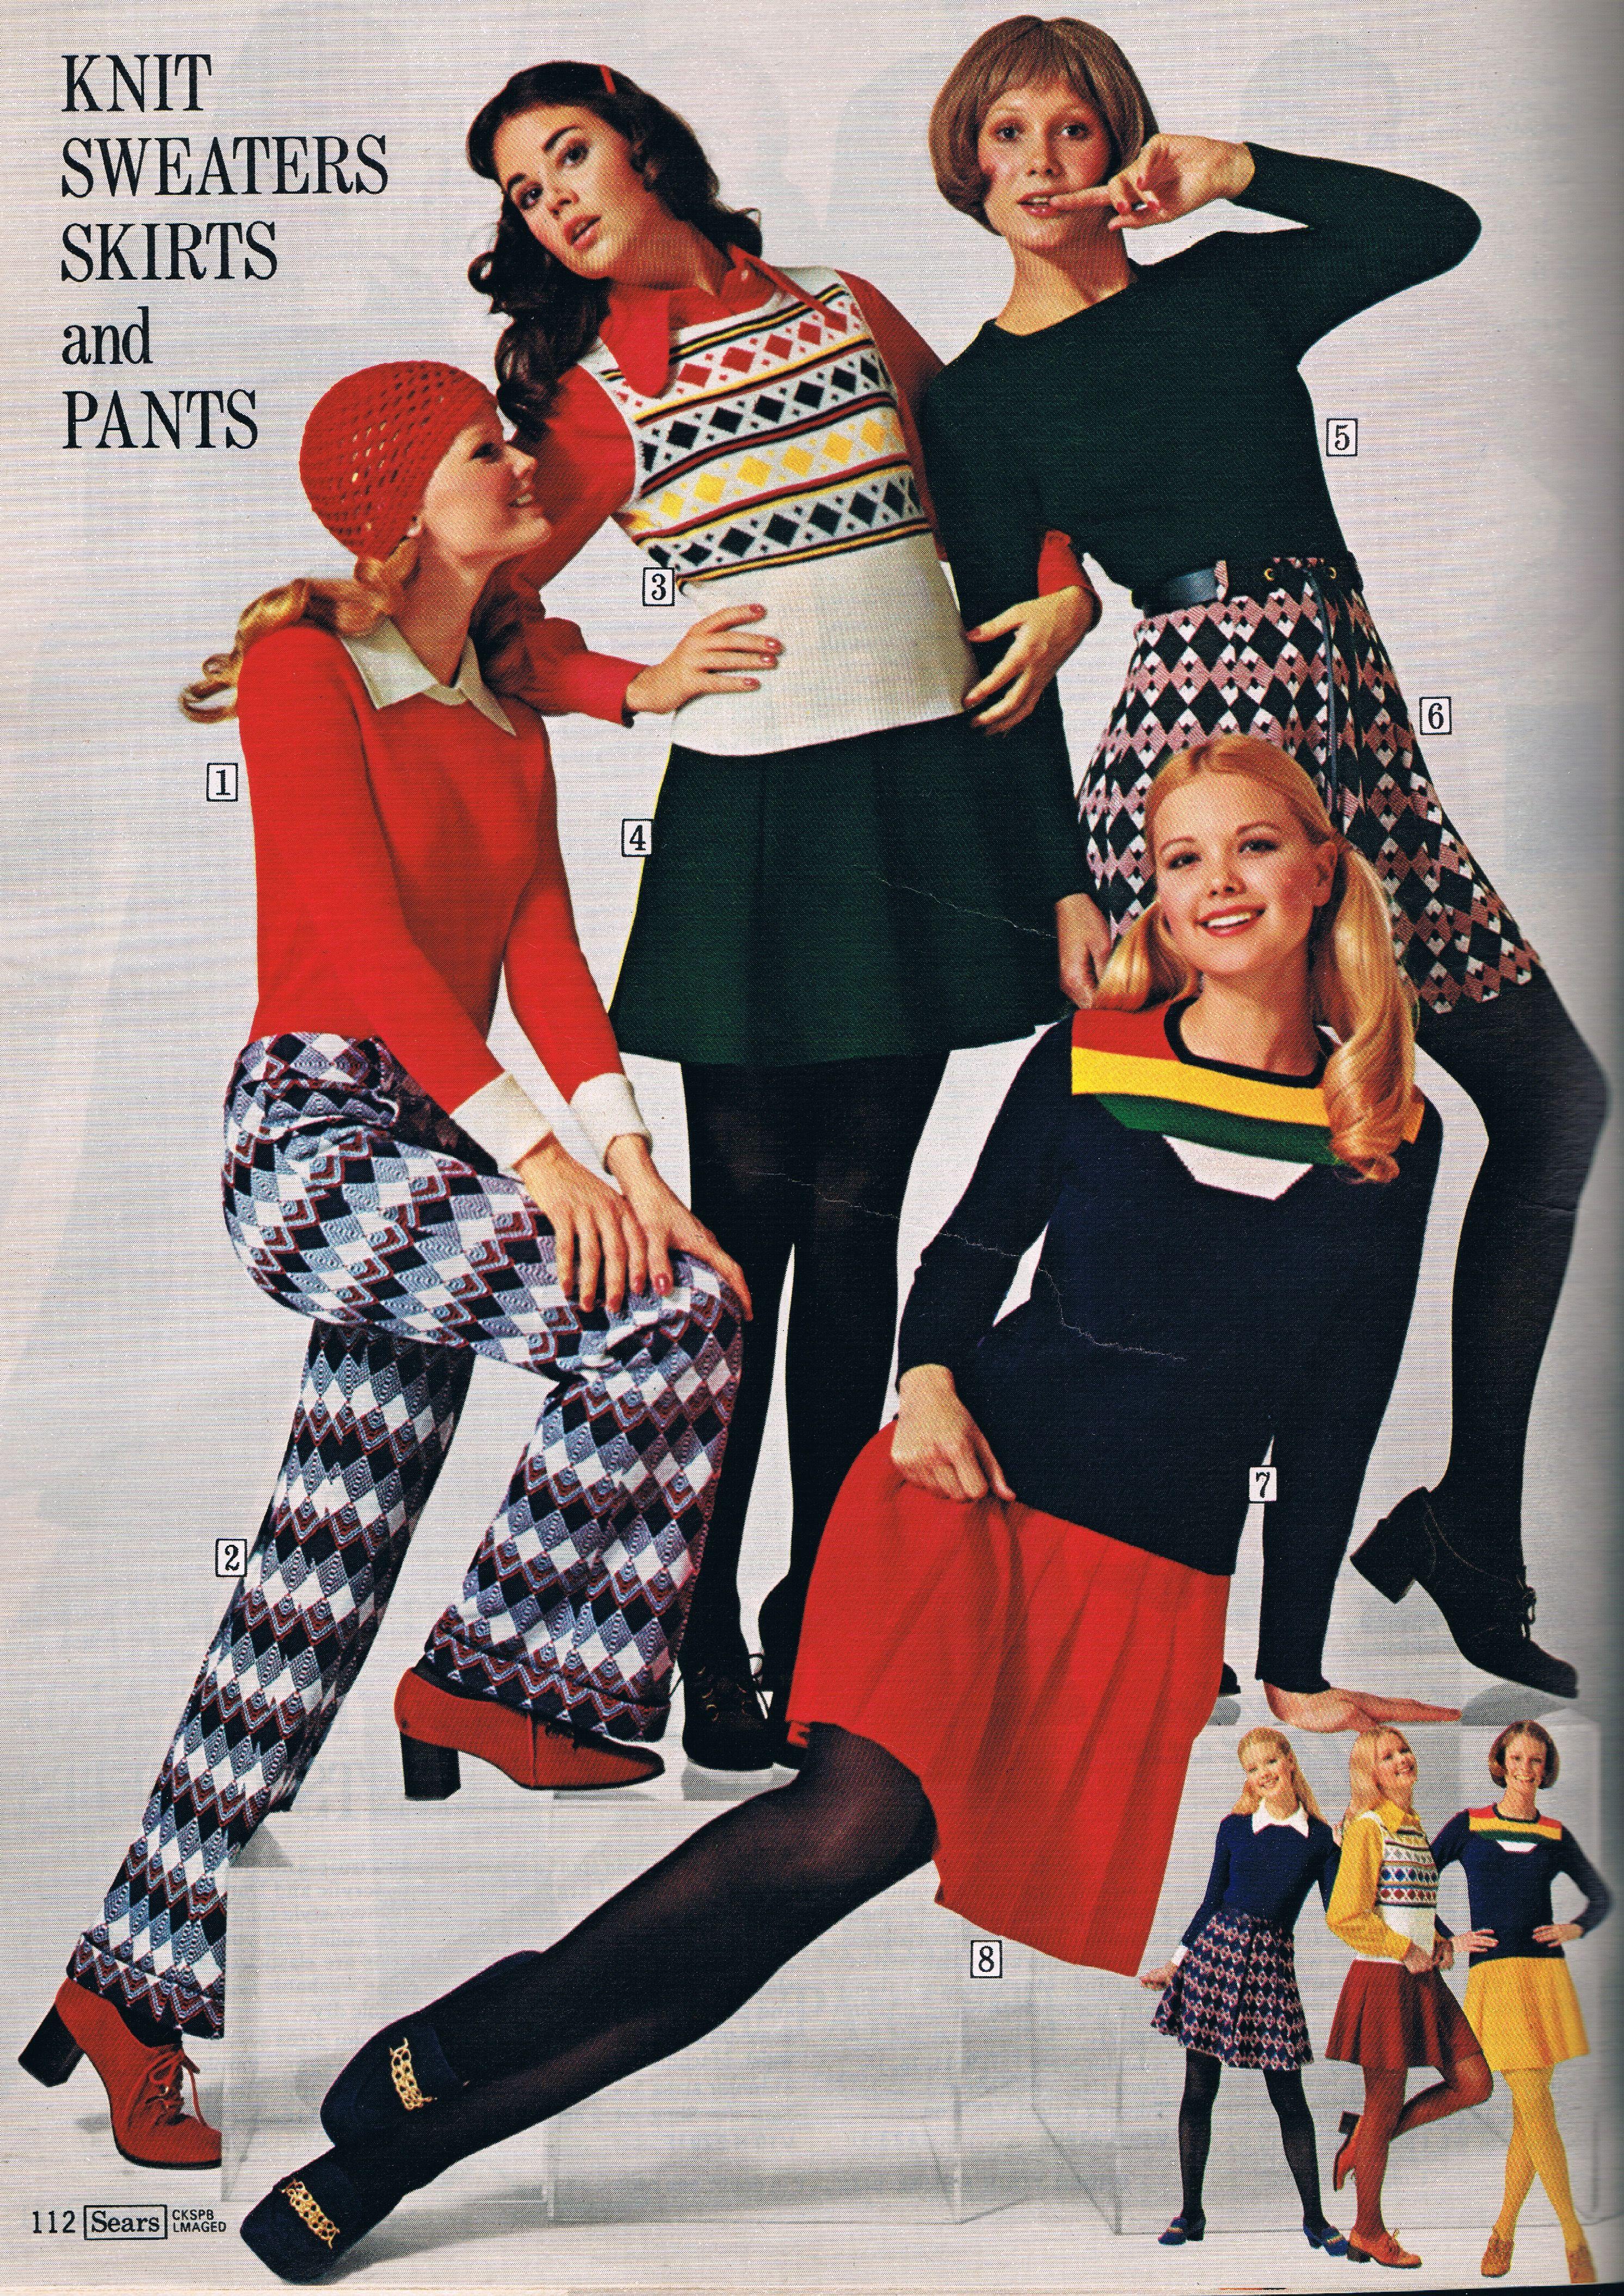 Teen fashion marketing